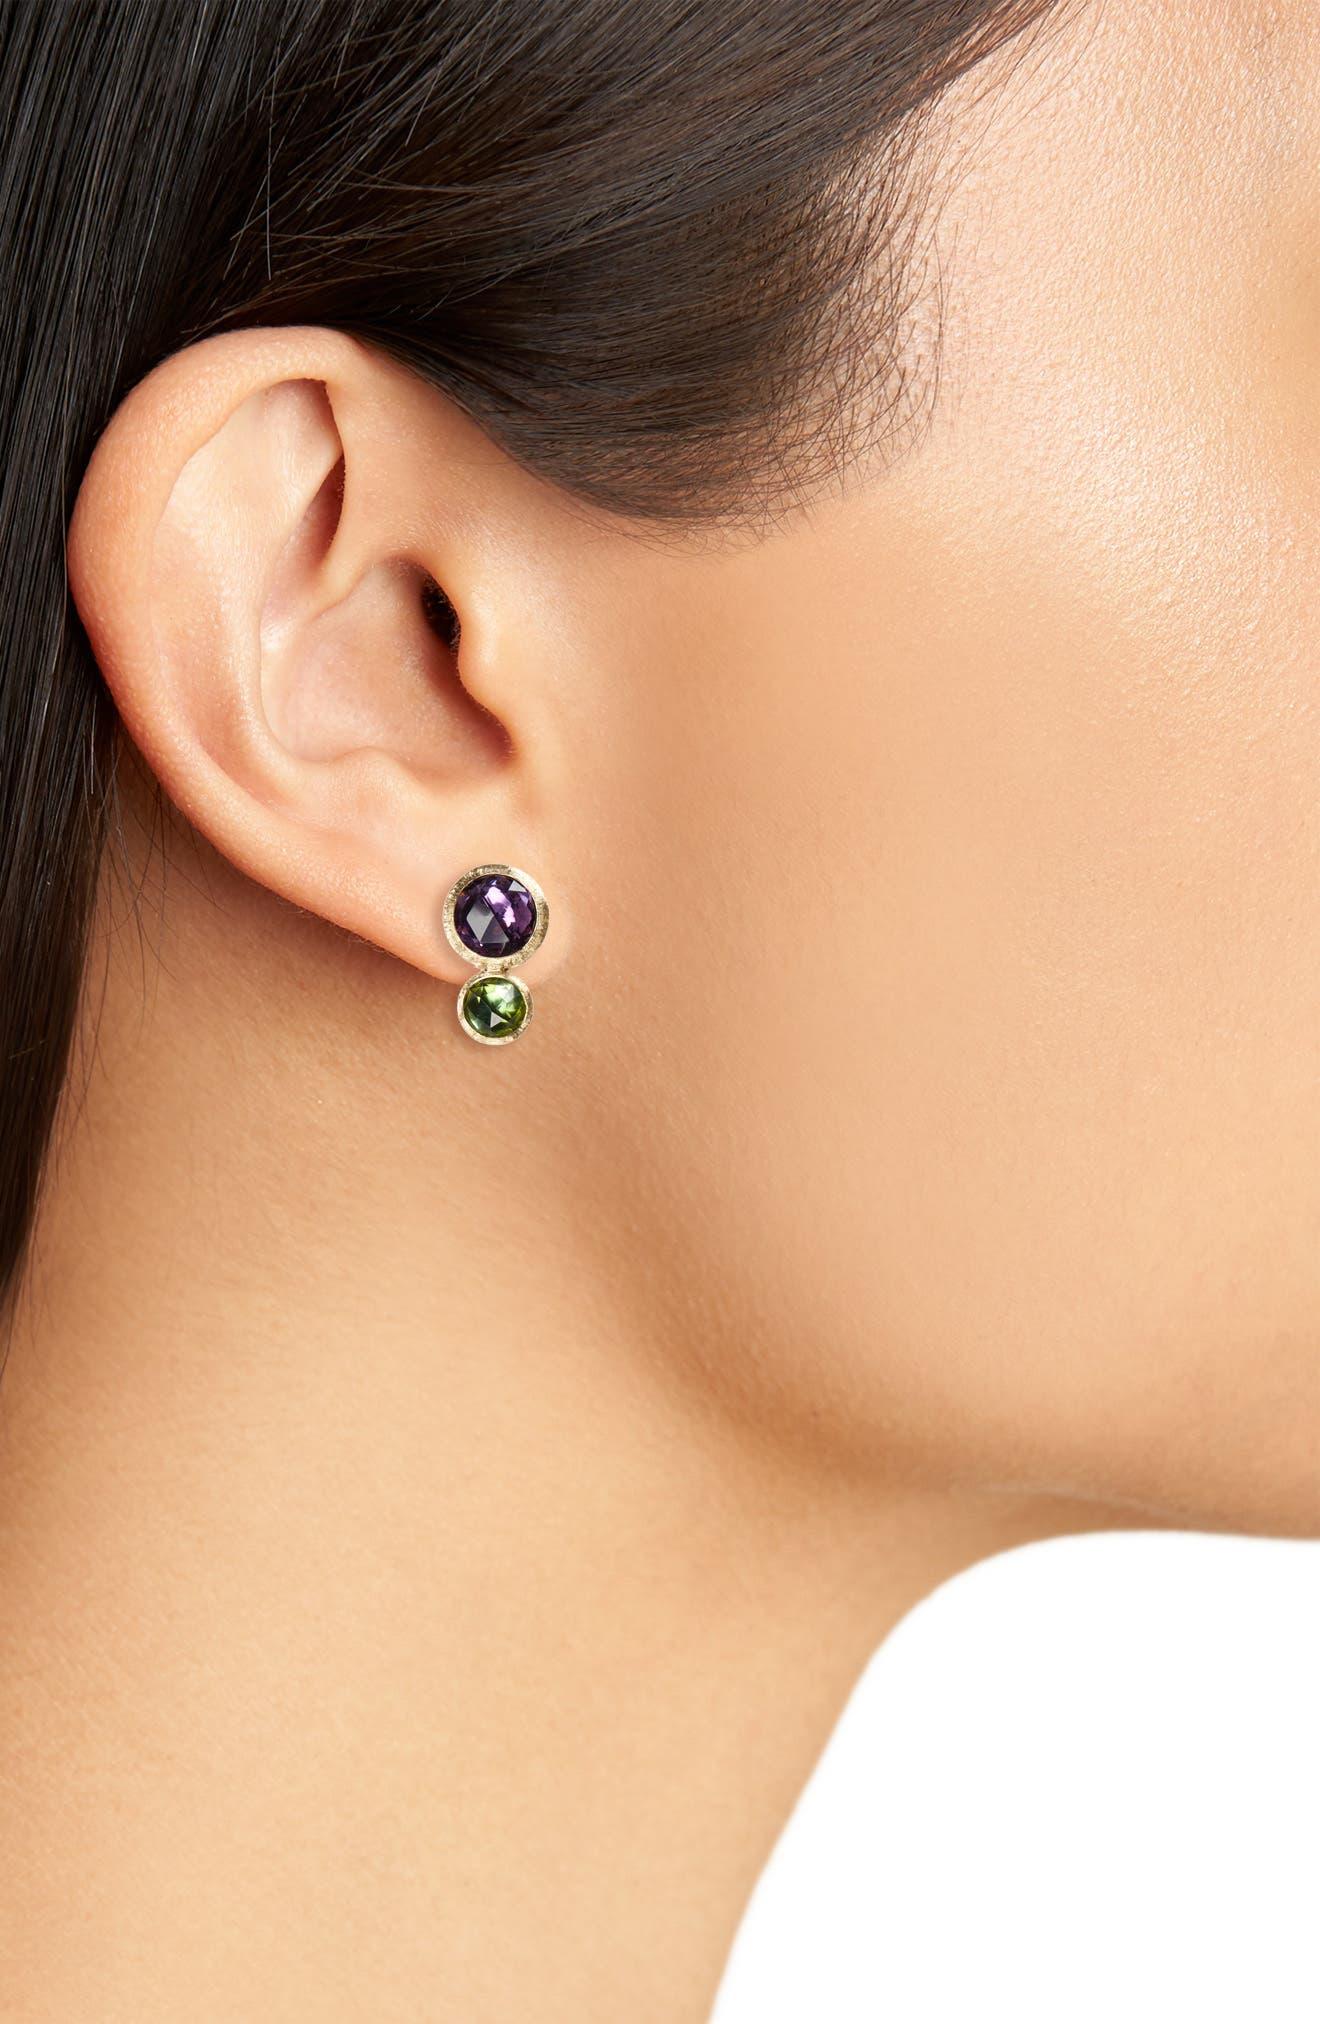 Jaipur Amethyst & Tourmaline Stud Earrings,                             Alternate thumbnail 2, color,                             710